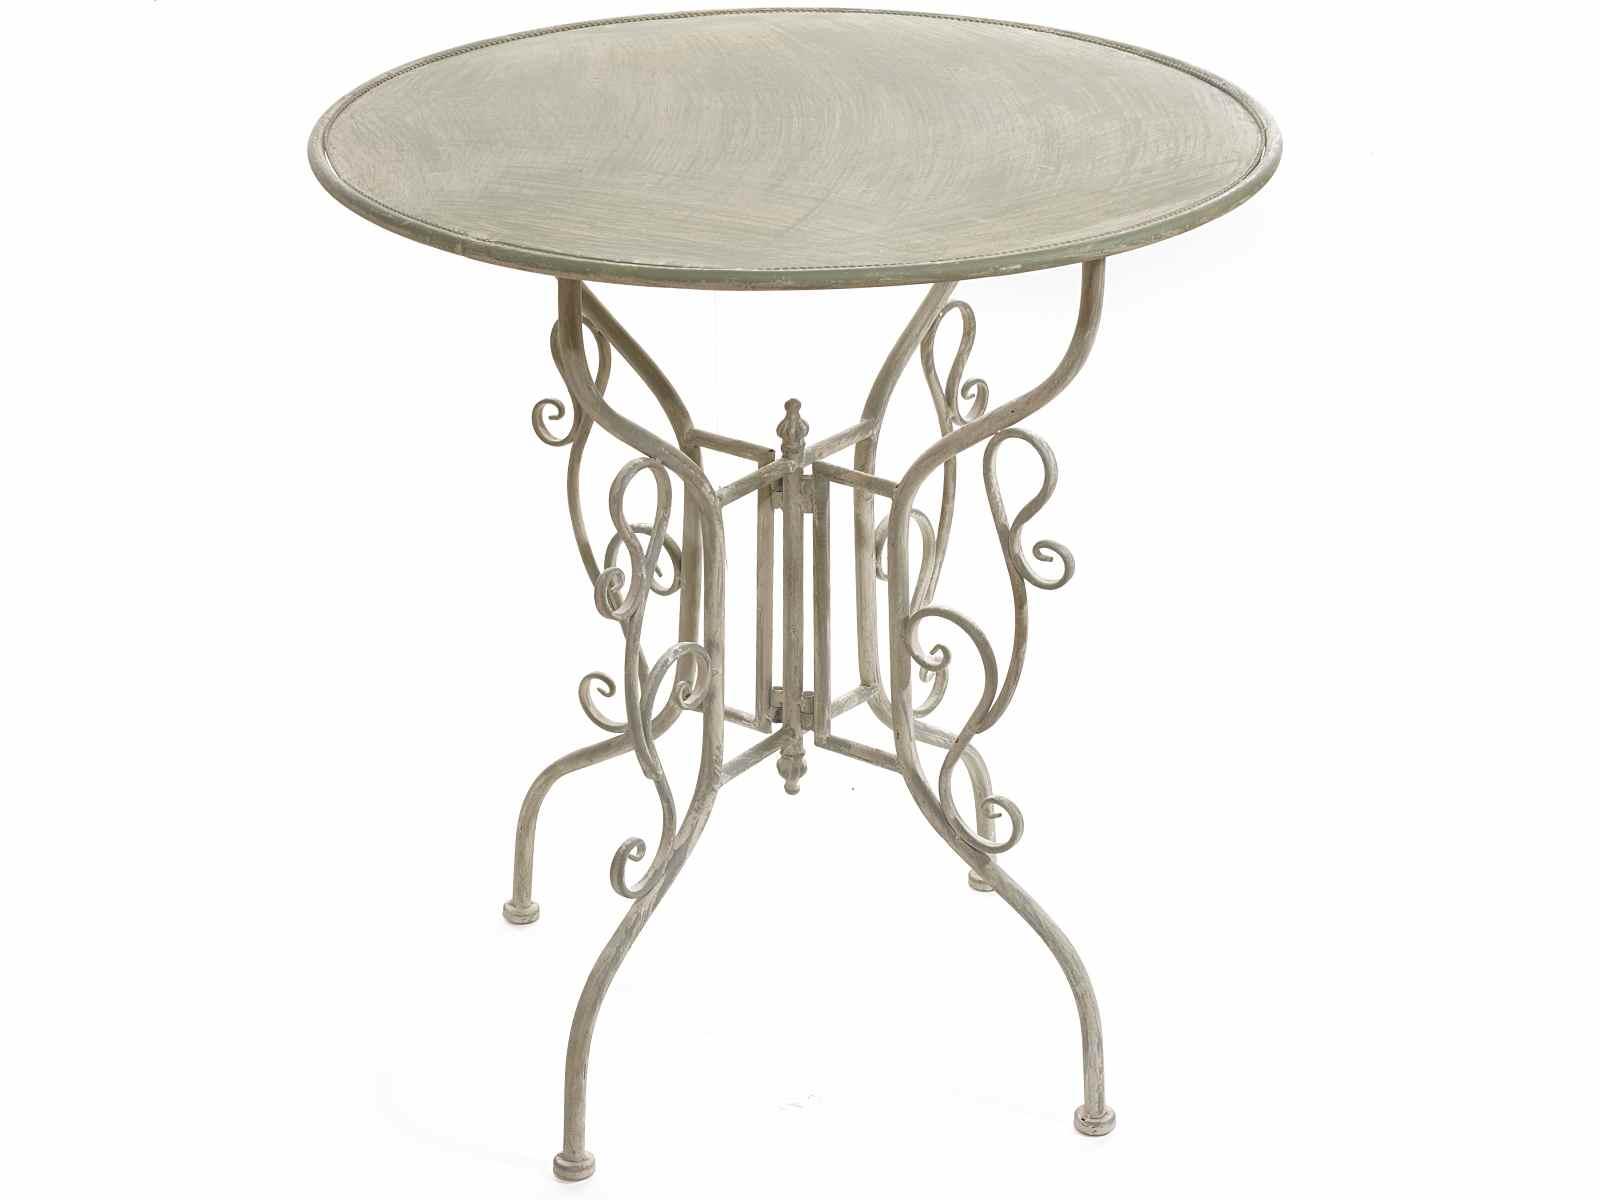 Table de jardin en métal avec garnitures vertes (53.20.55 ...